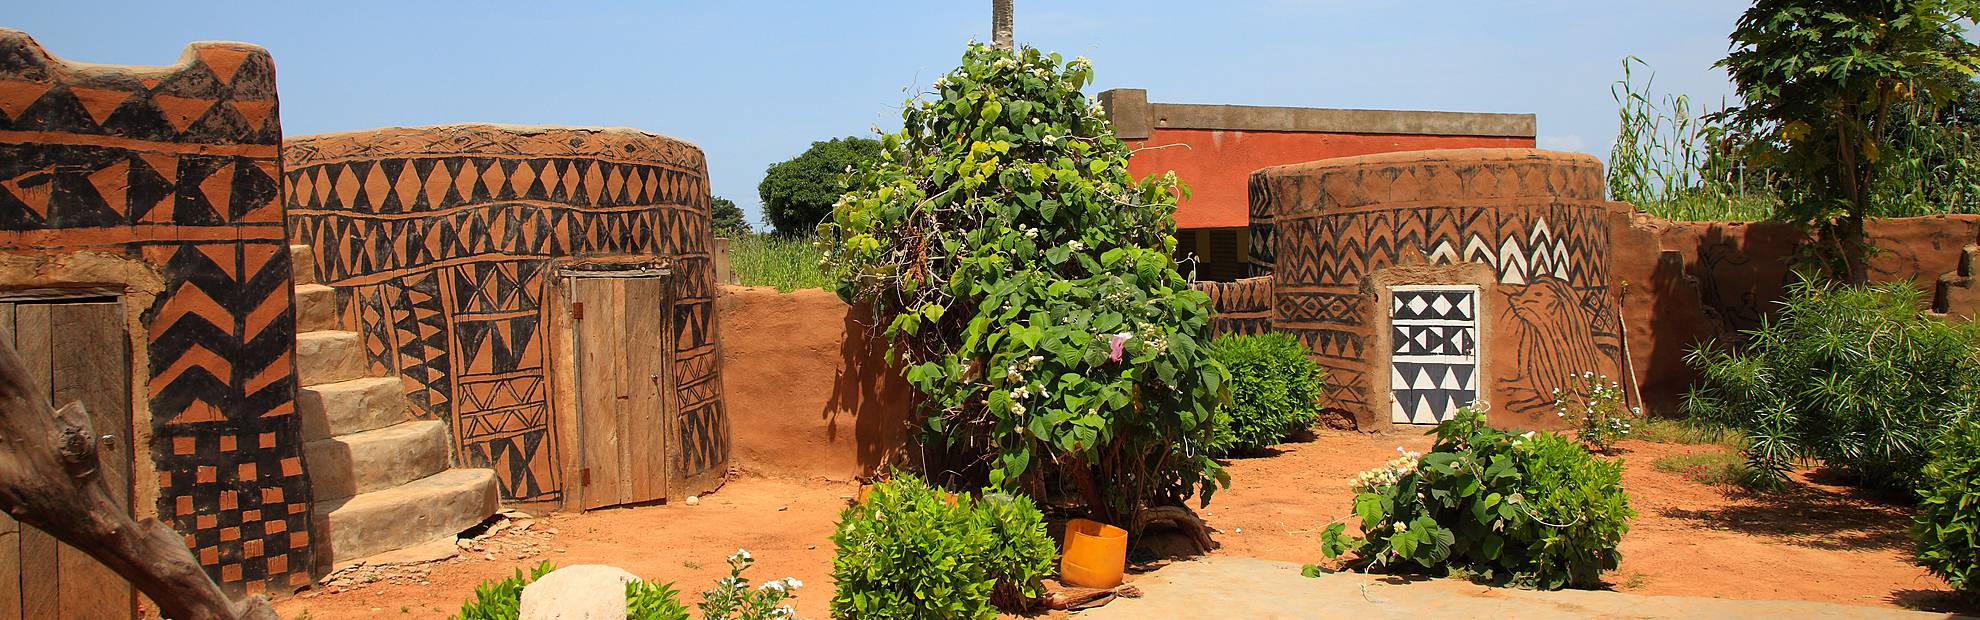 Voyage au Burkina Faso